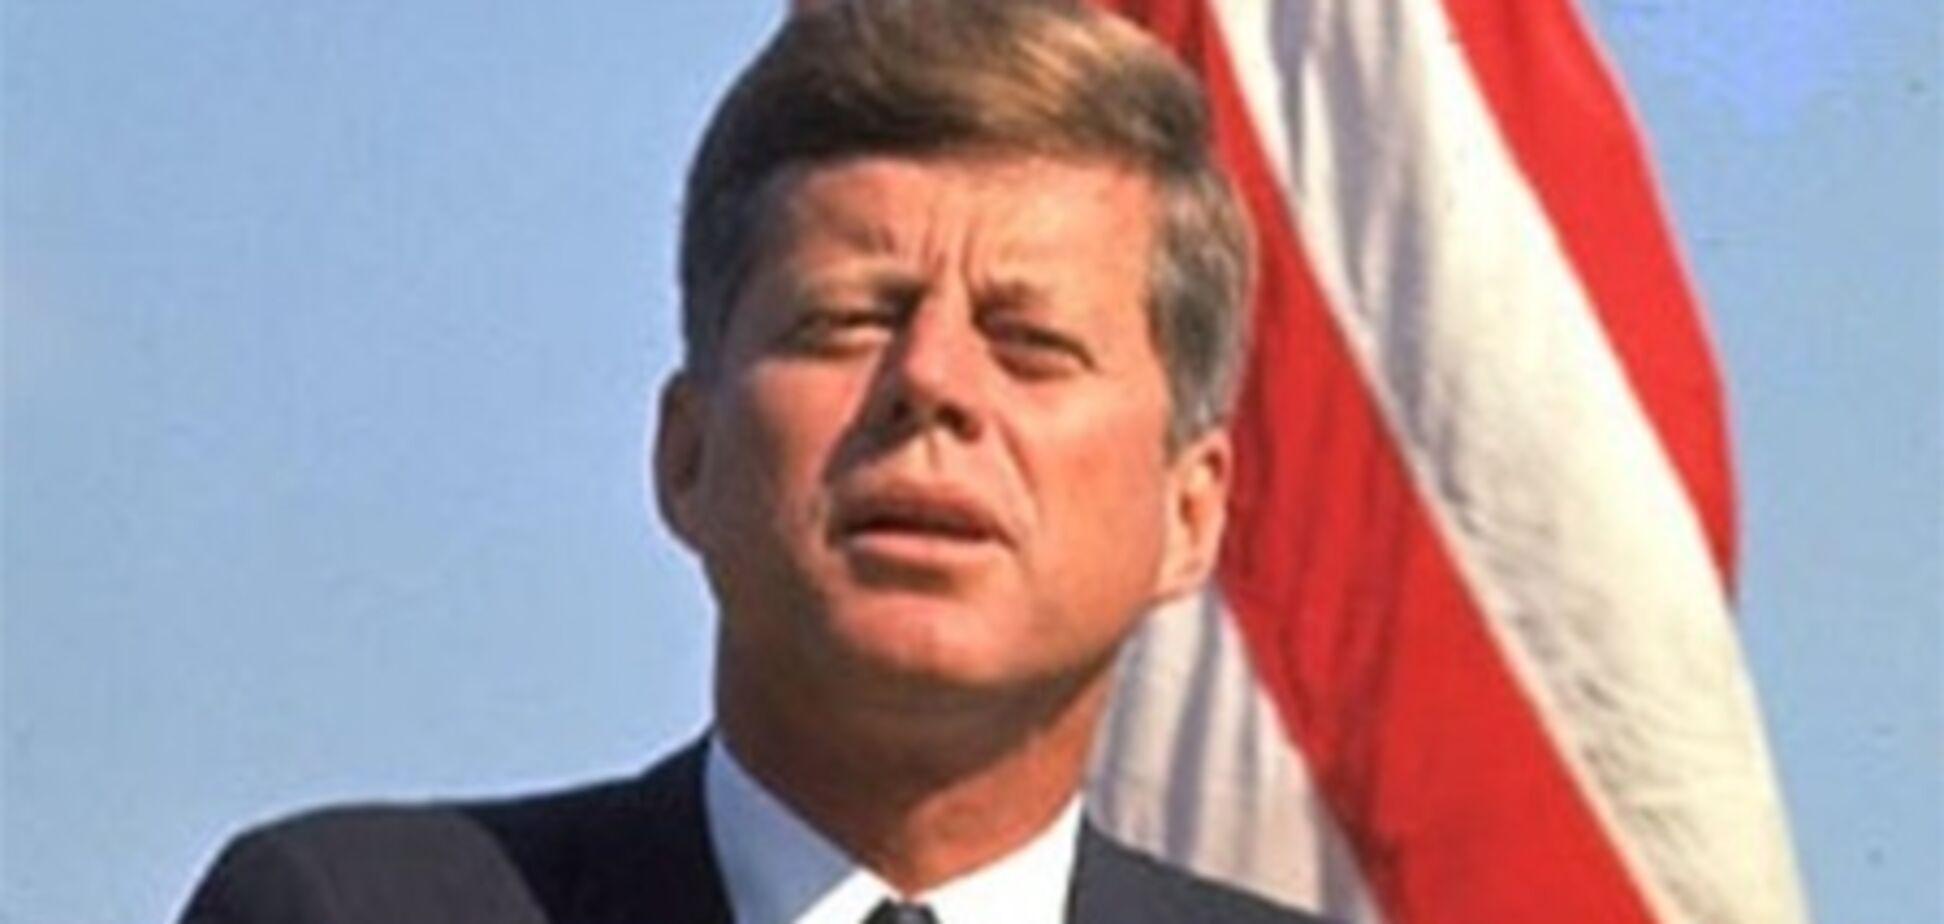 Кеннеди хотел сбросить на Кубу ядерную бомбу